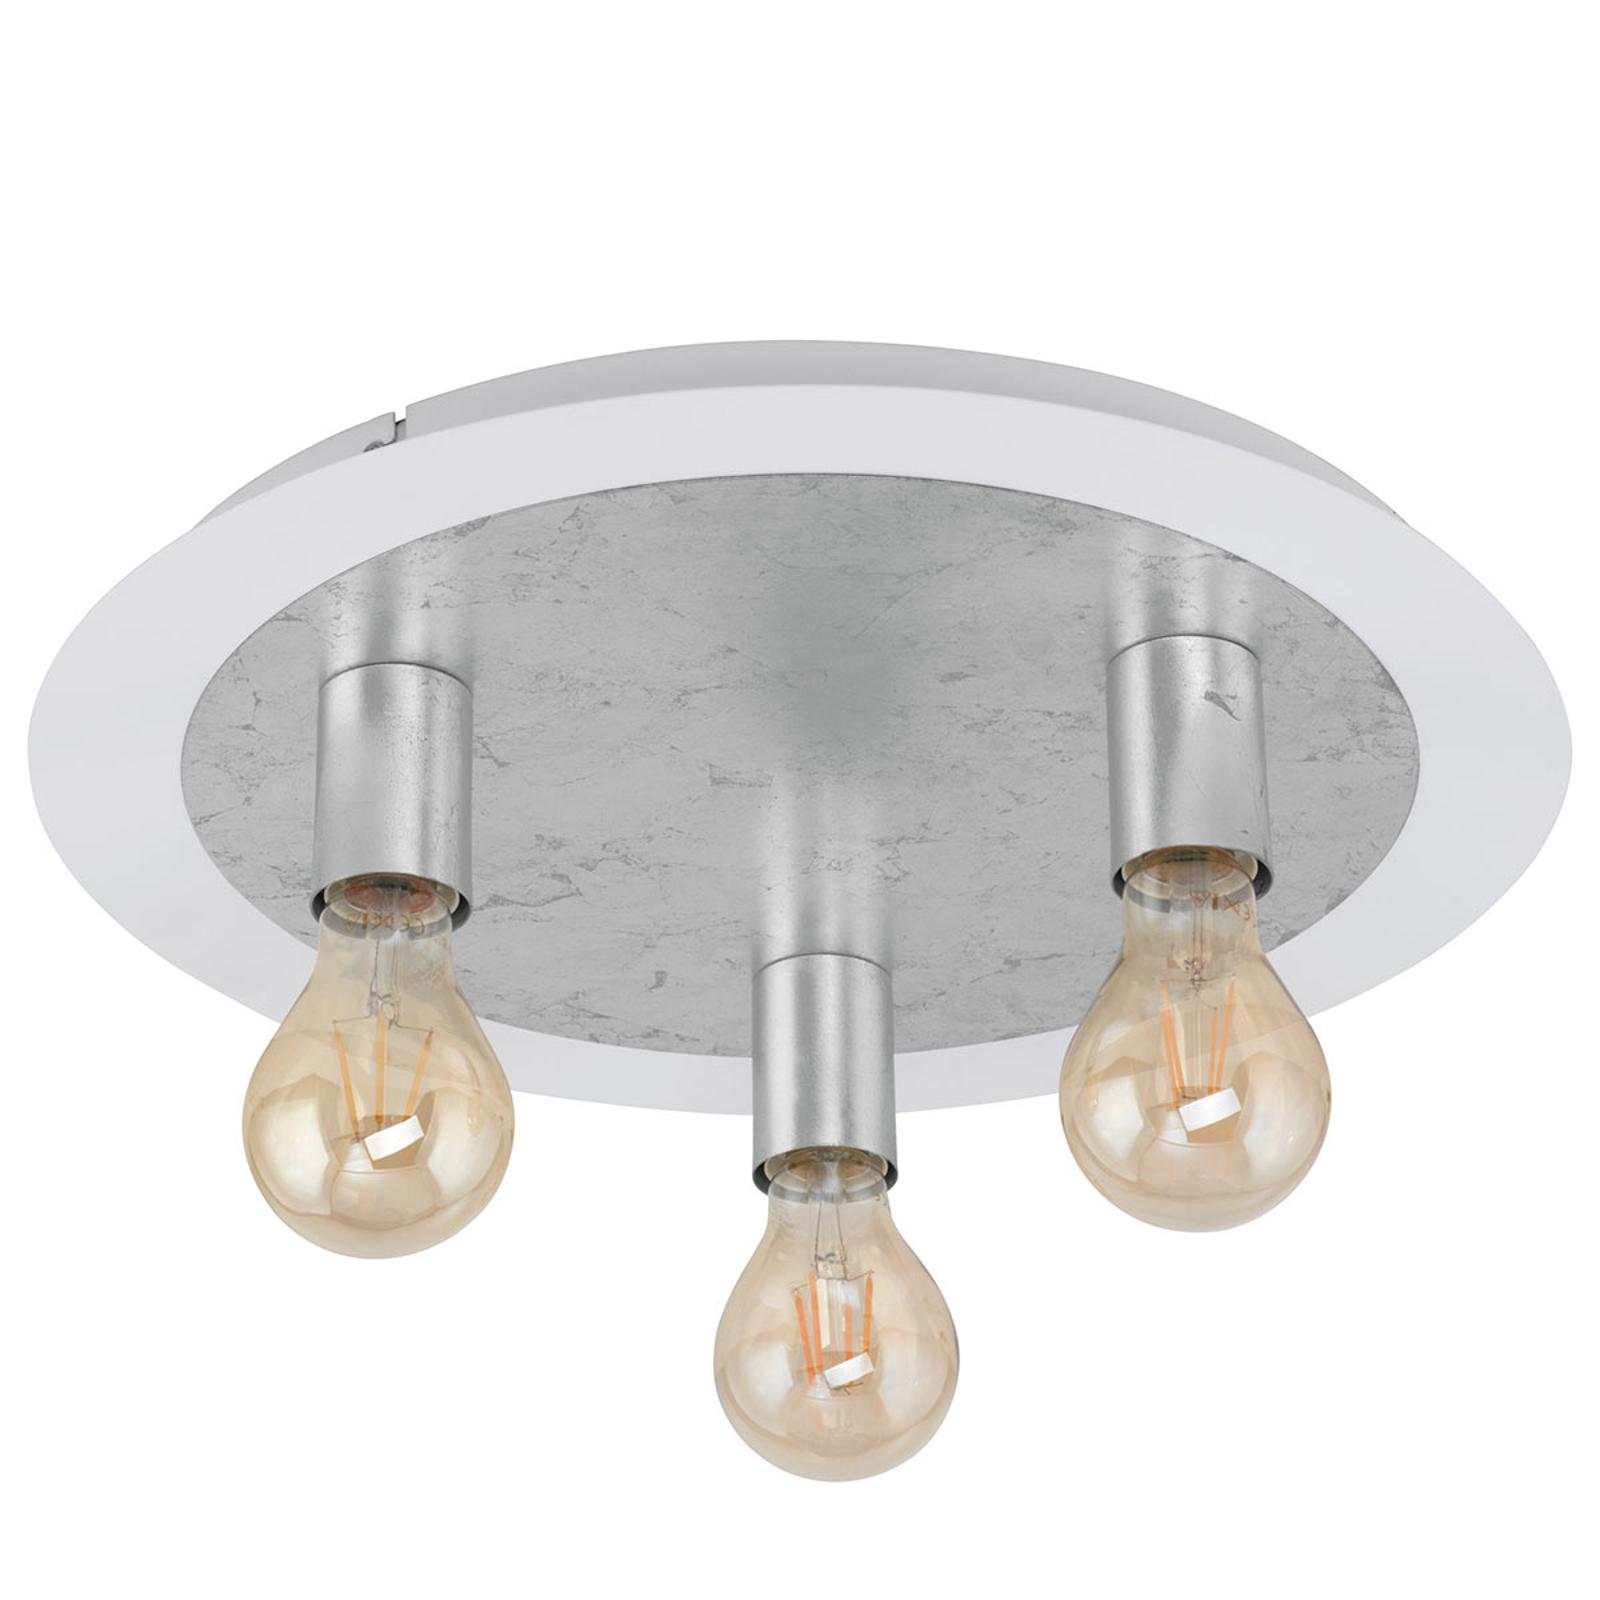 Taklampe Passano tre lyskilder sølv